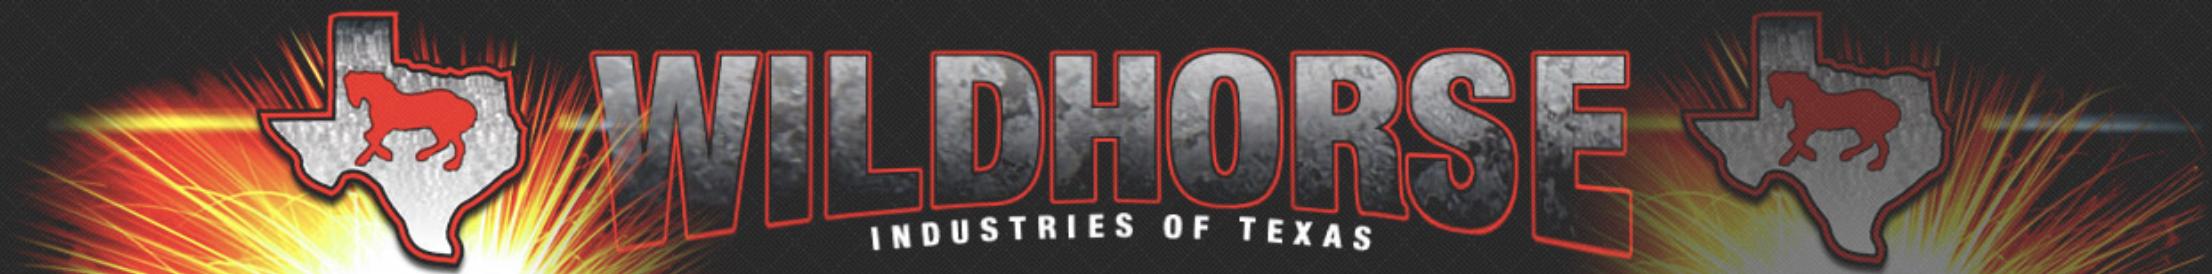 Wildhorse Industries of Texas